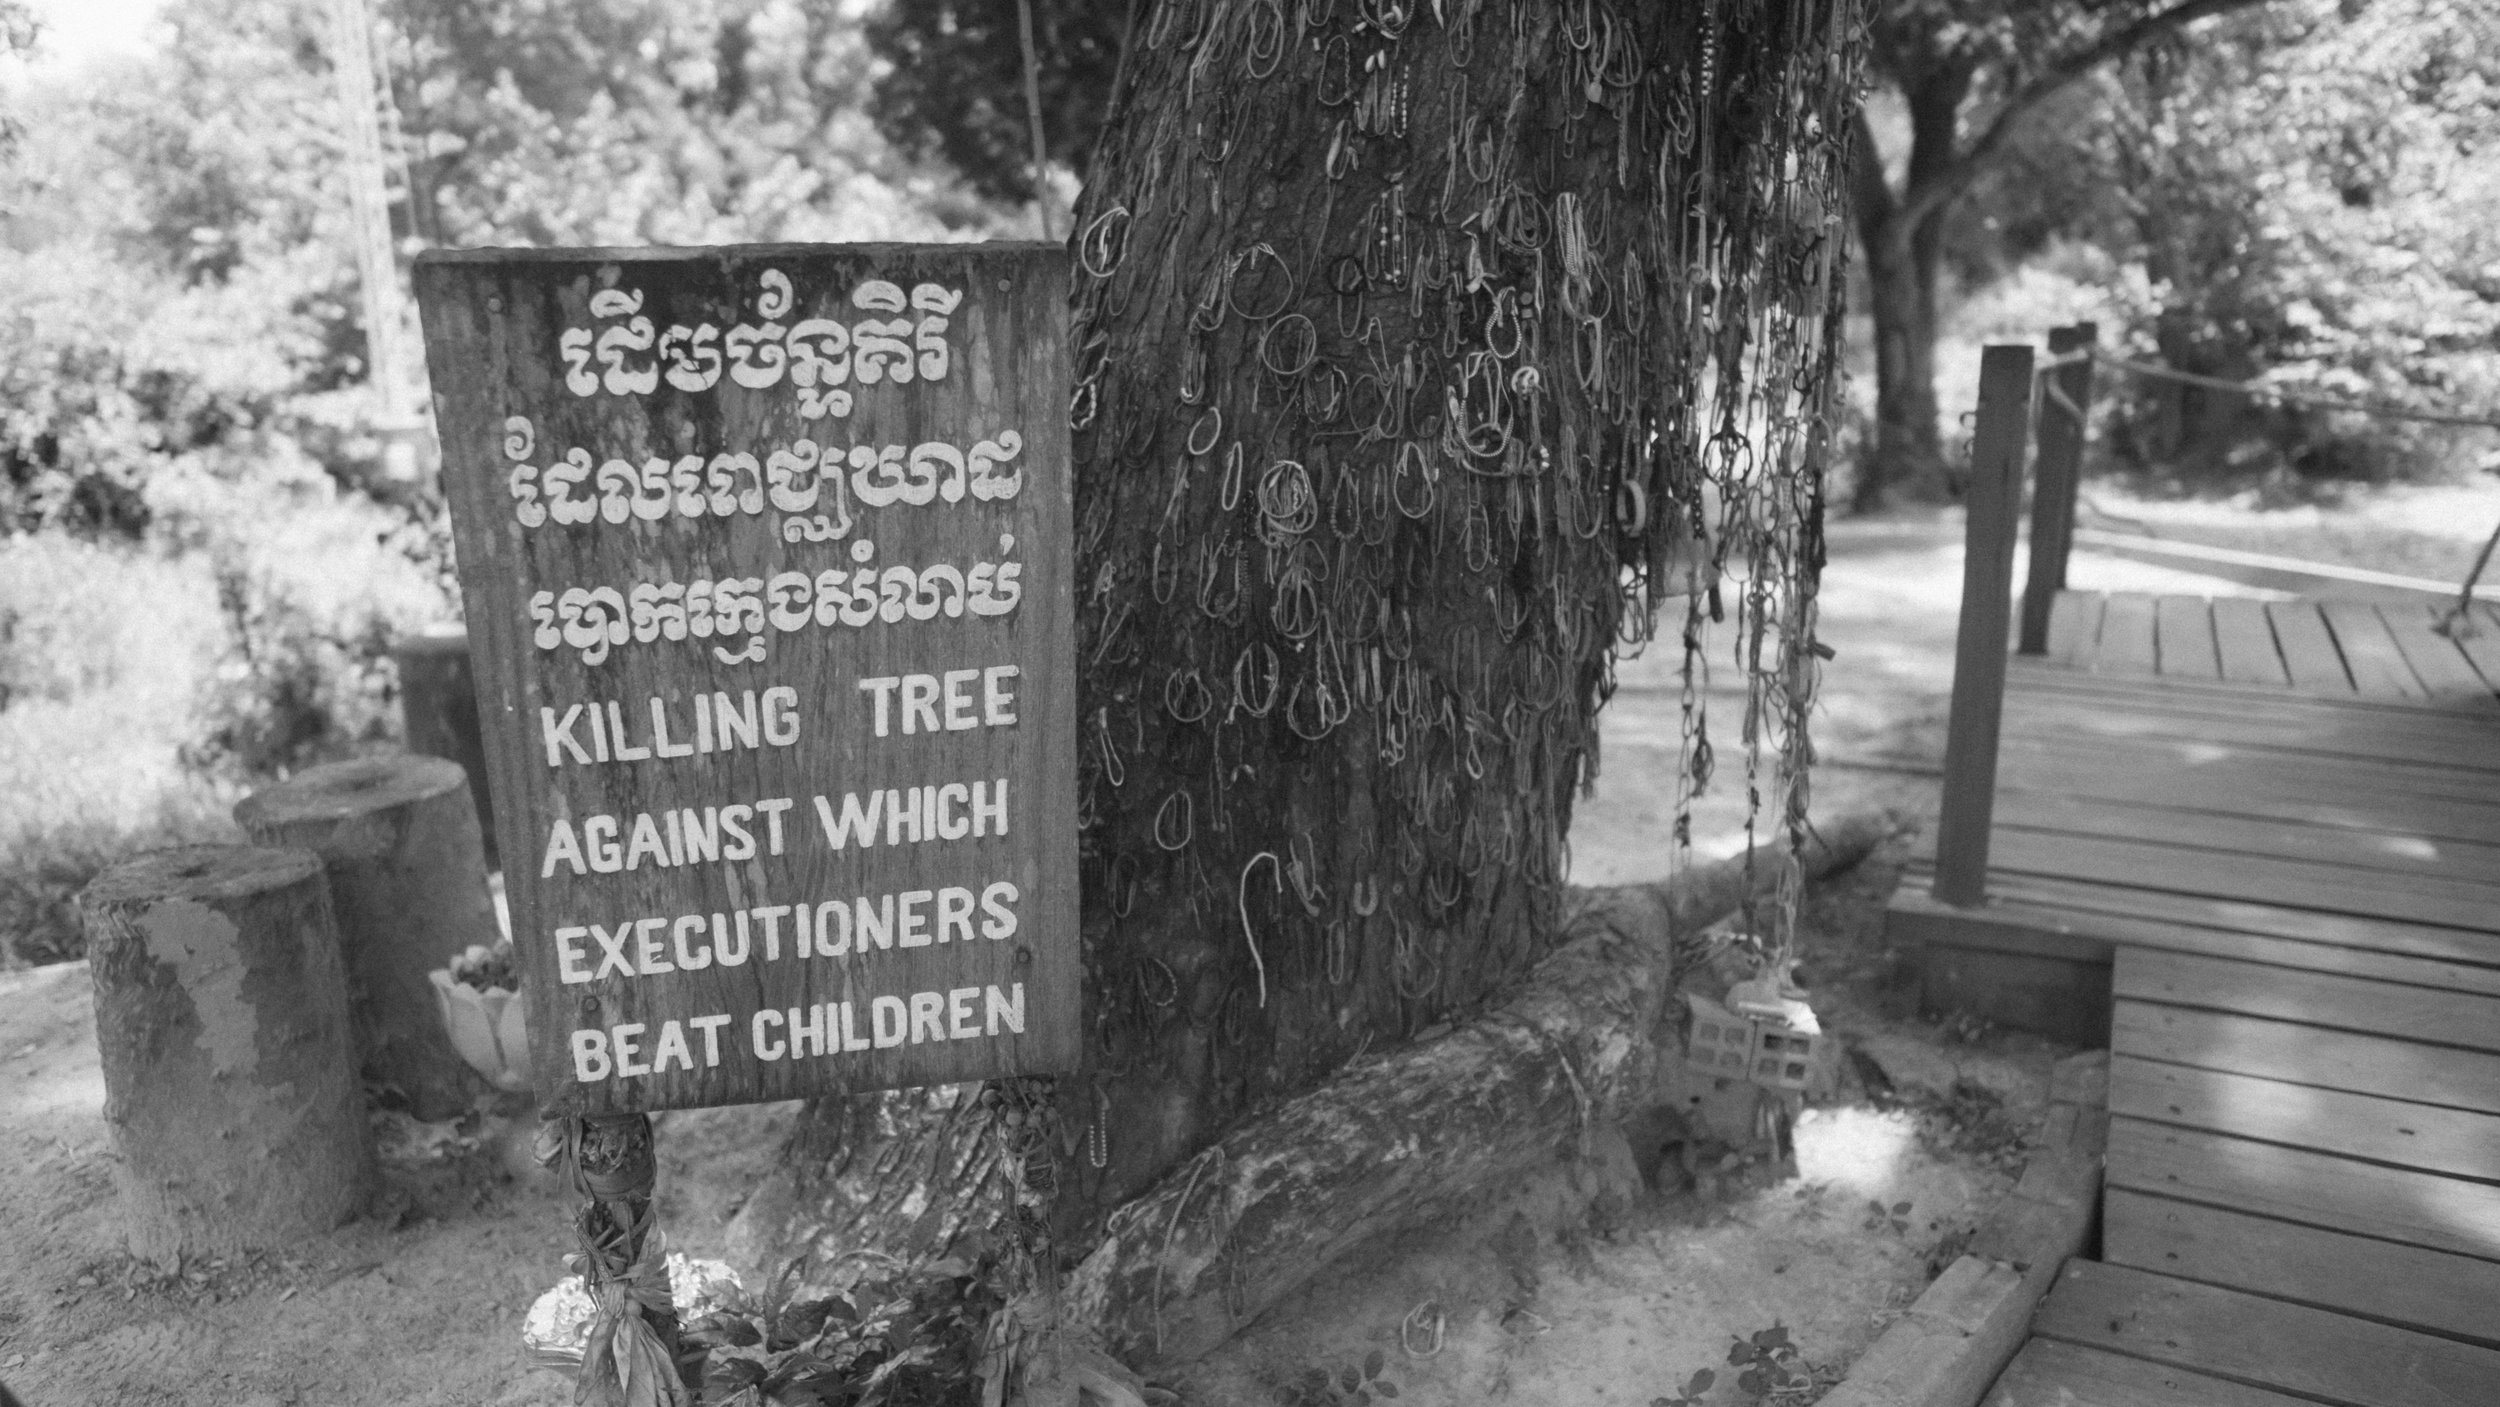 Choeung Ek, Cambodia